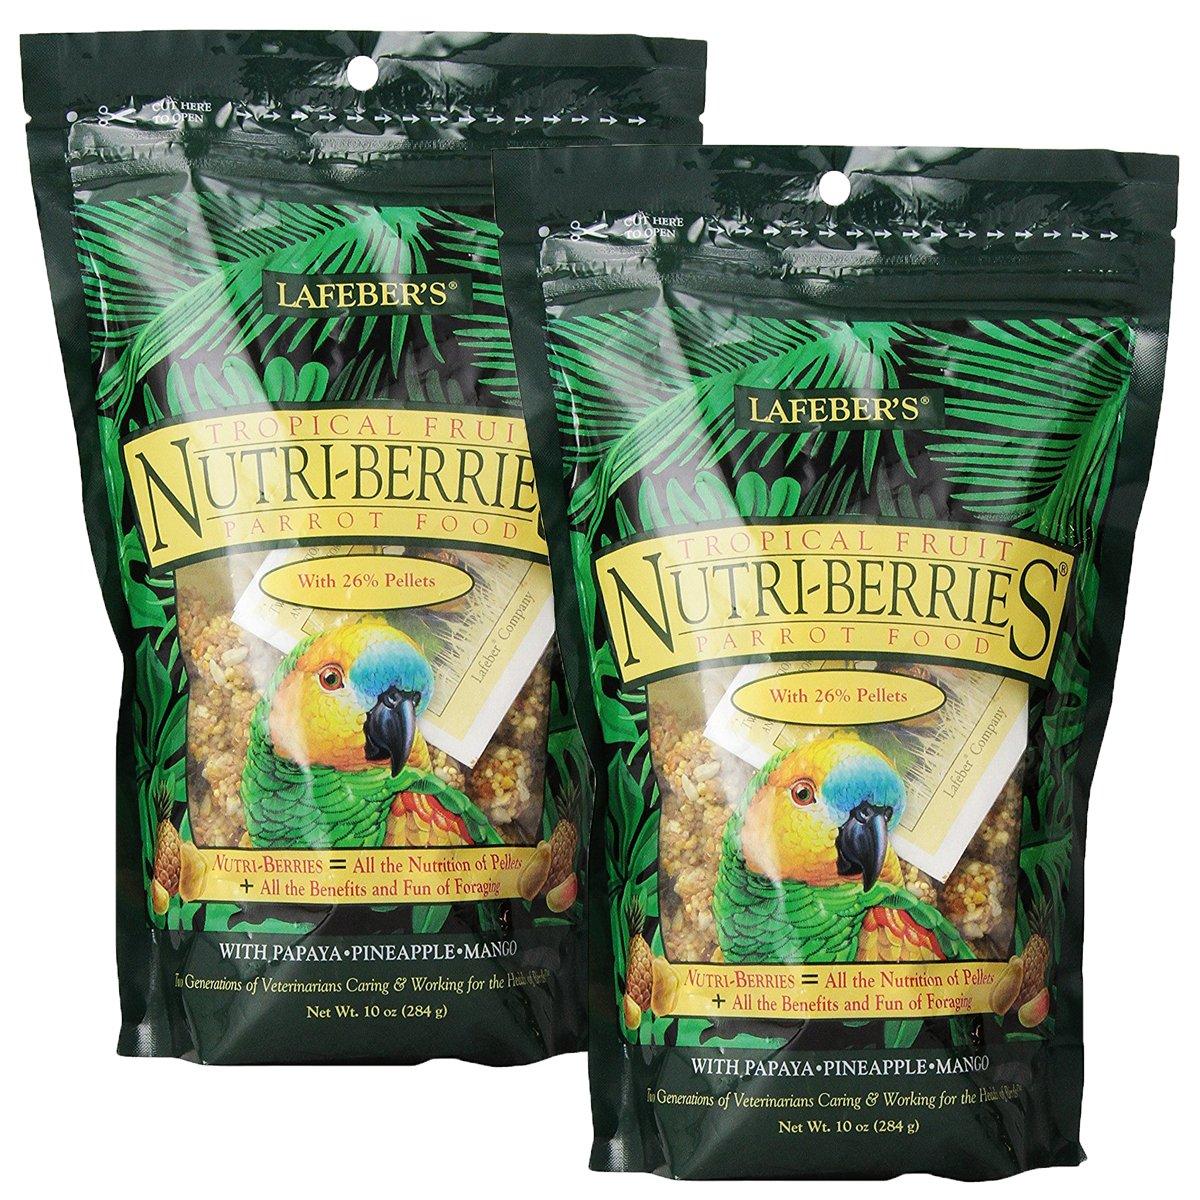 Lafeber Tropical Fruit Nutri-Berries Parrot Food 10 oz bag (2 Pack) by LAFEBER'S